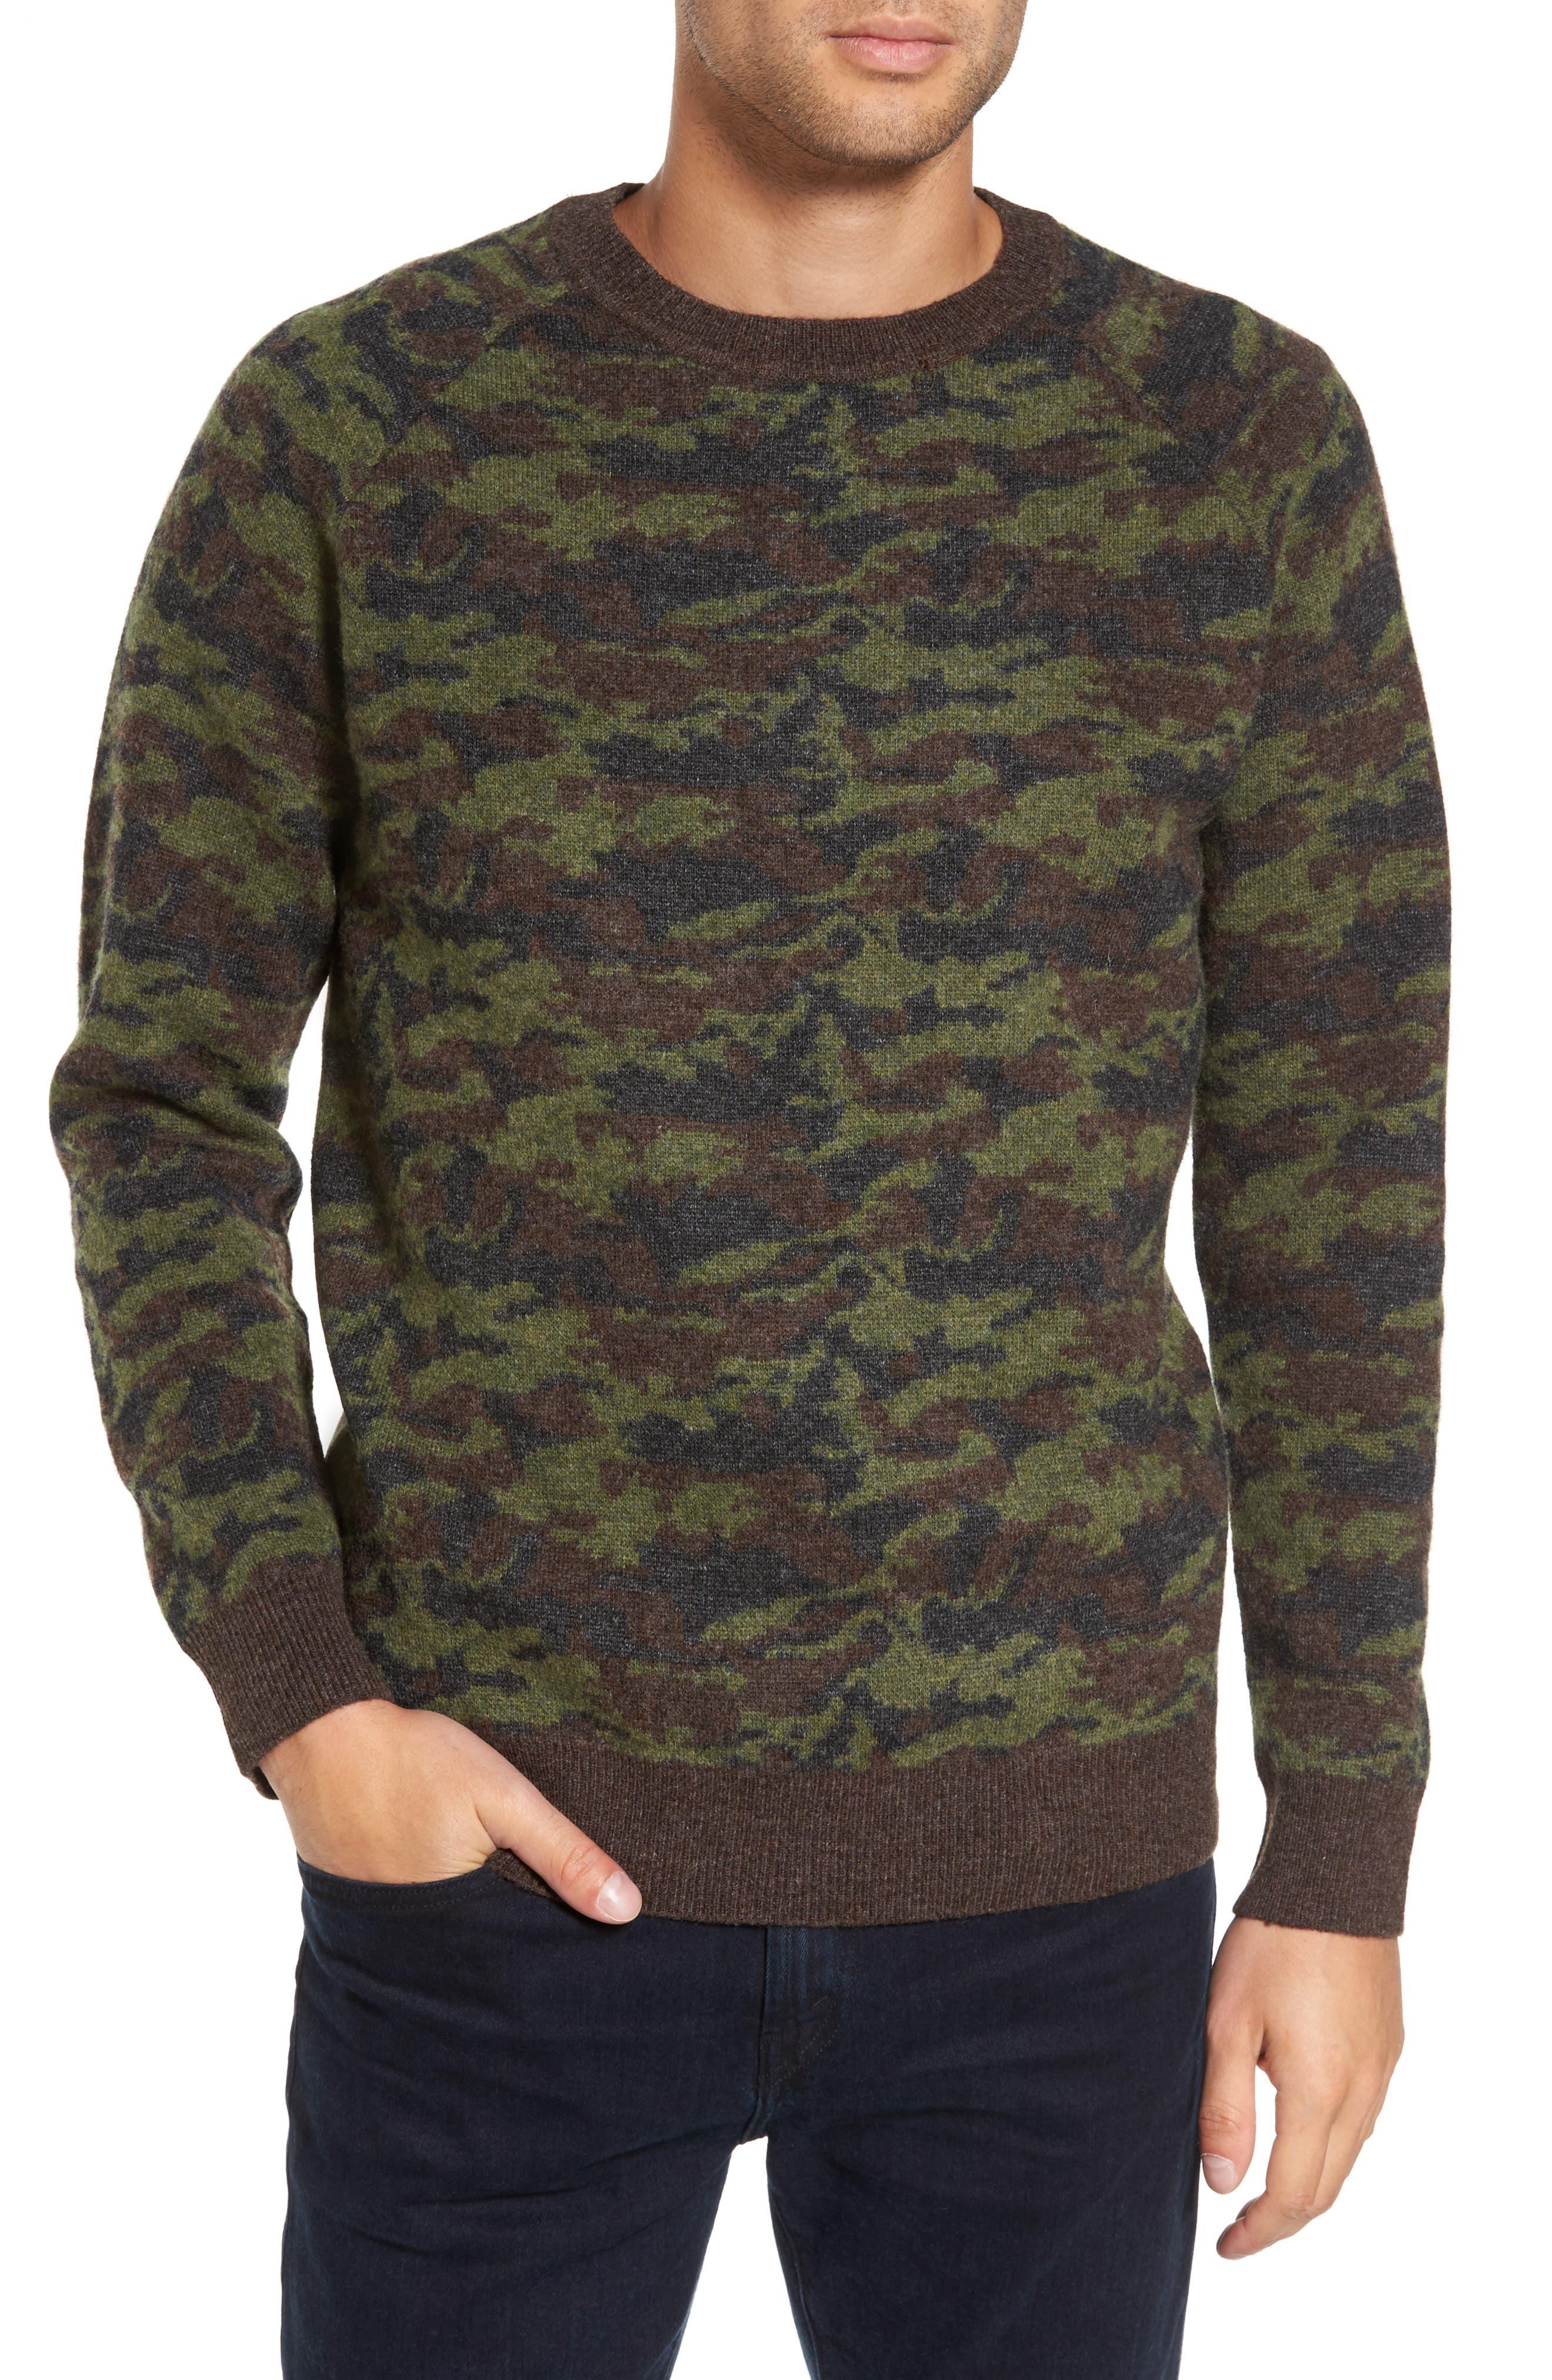 Slate & Stone Wool Camo Sweater